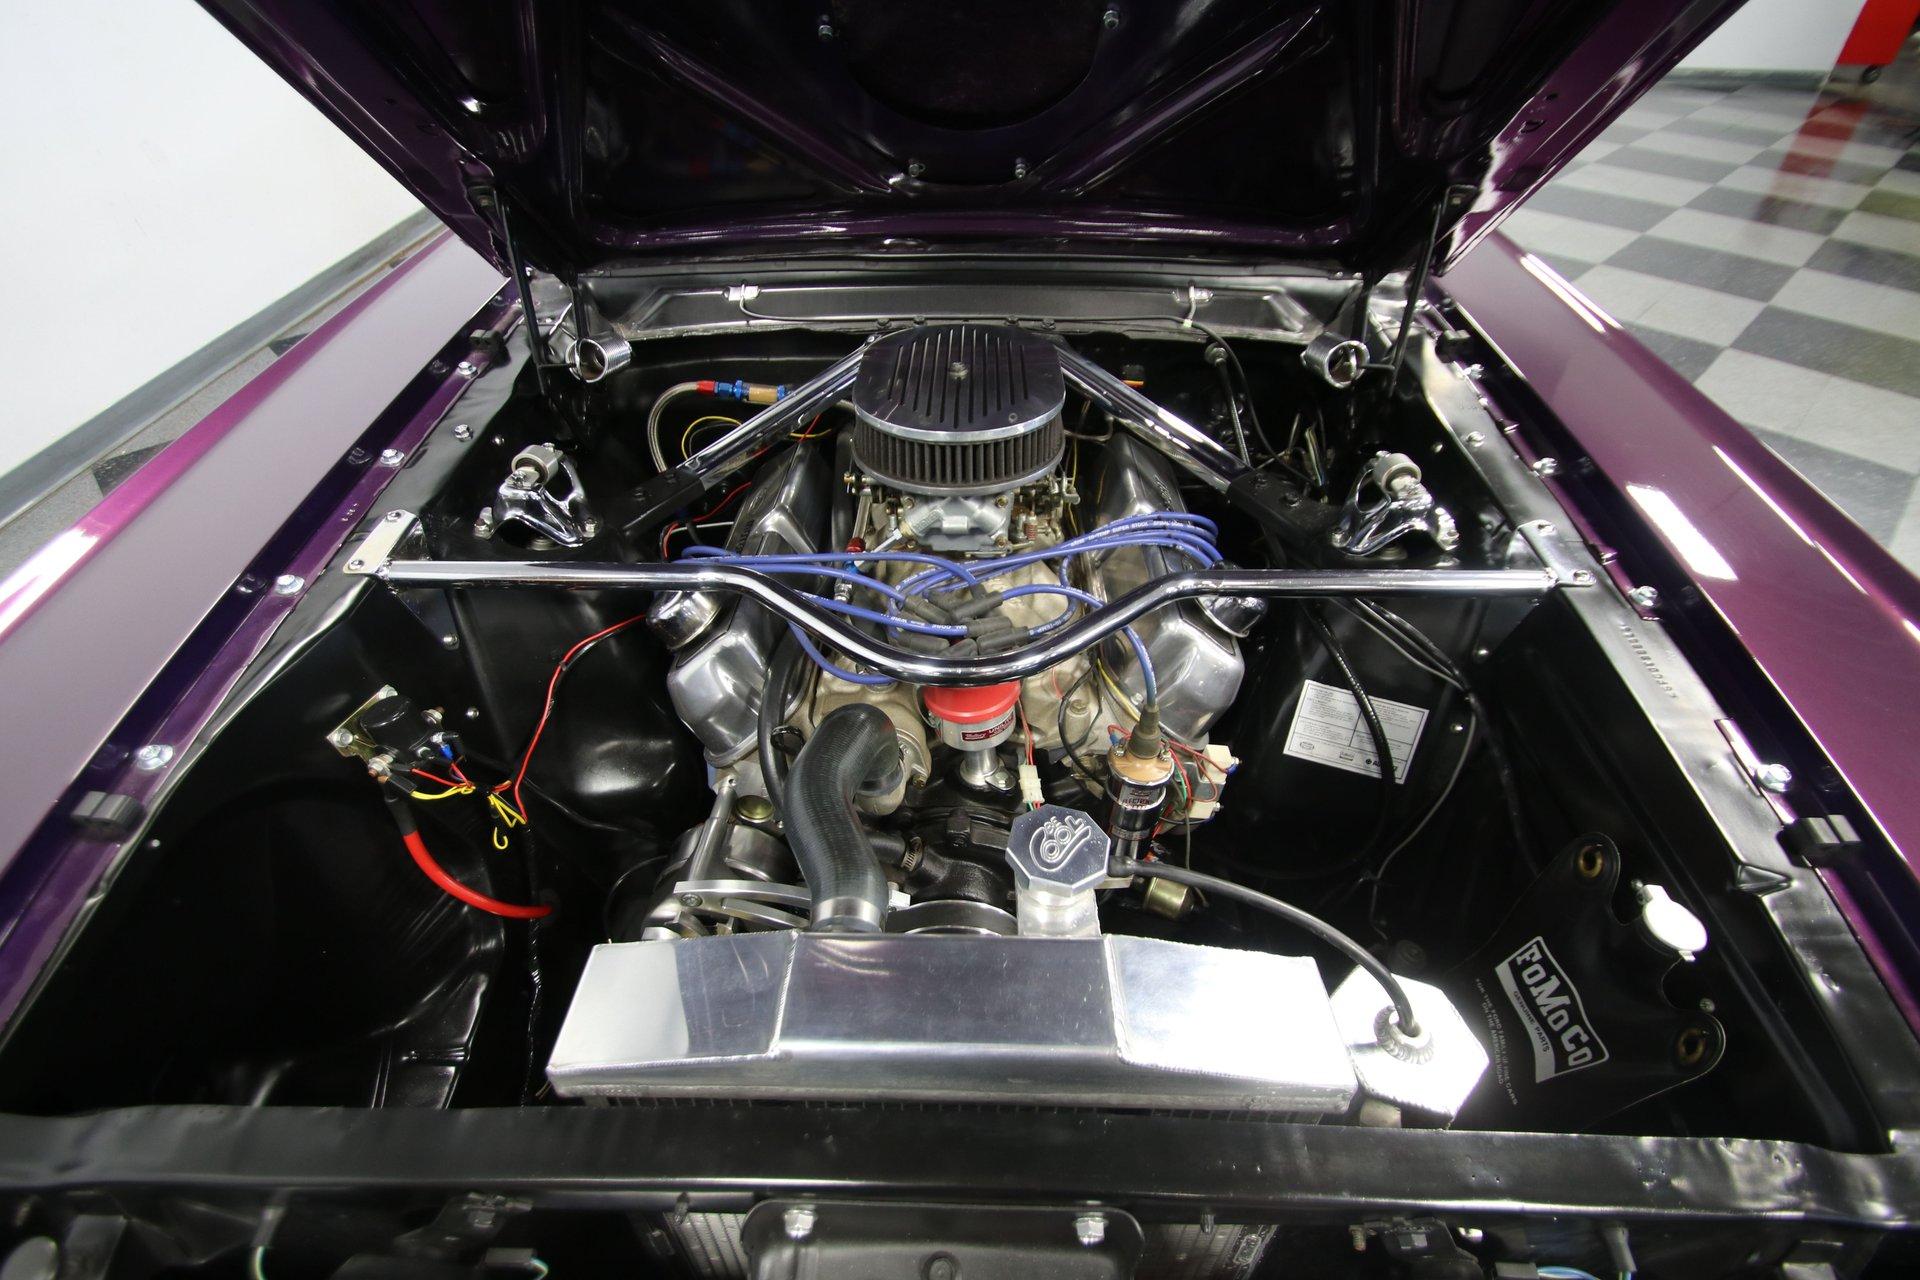 1966 ford mustang 2 2 fastback restomod